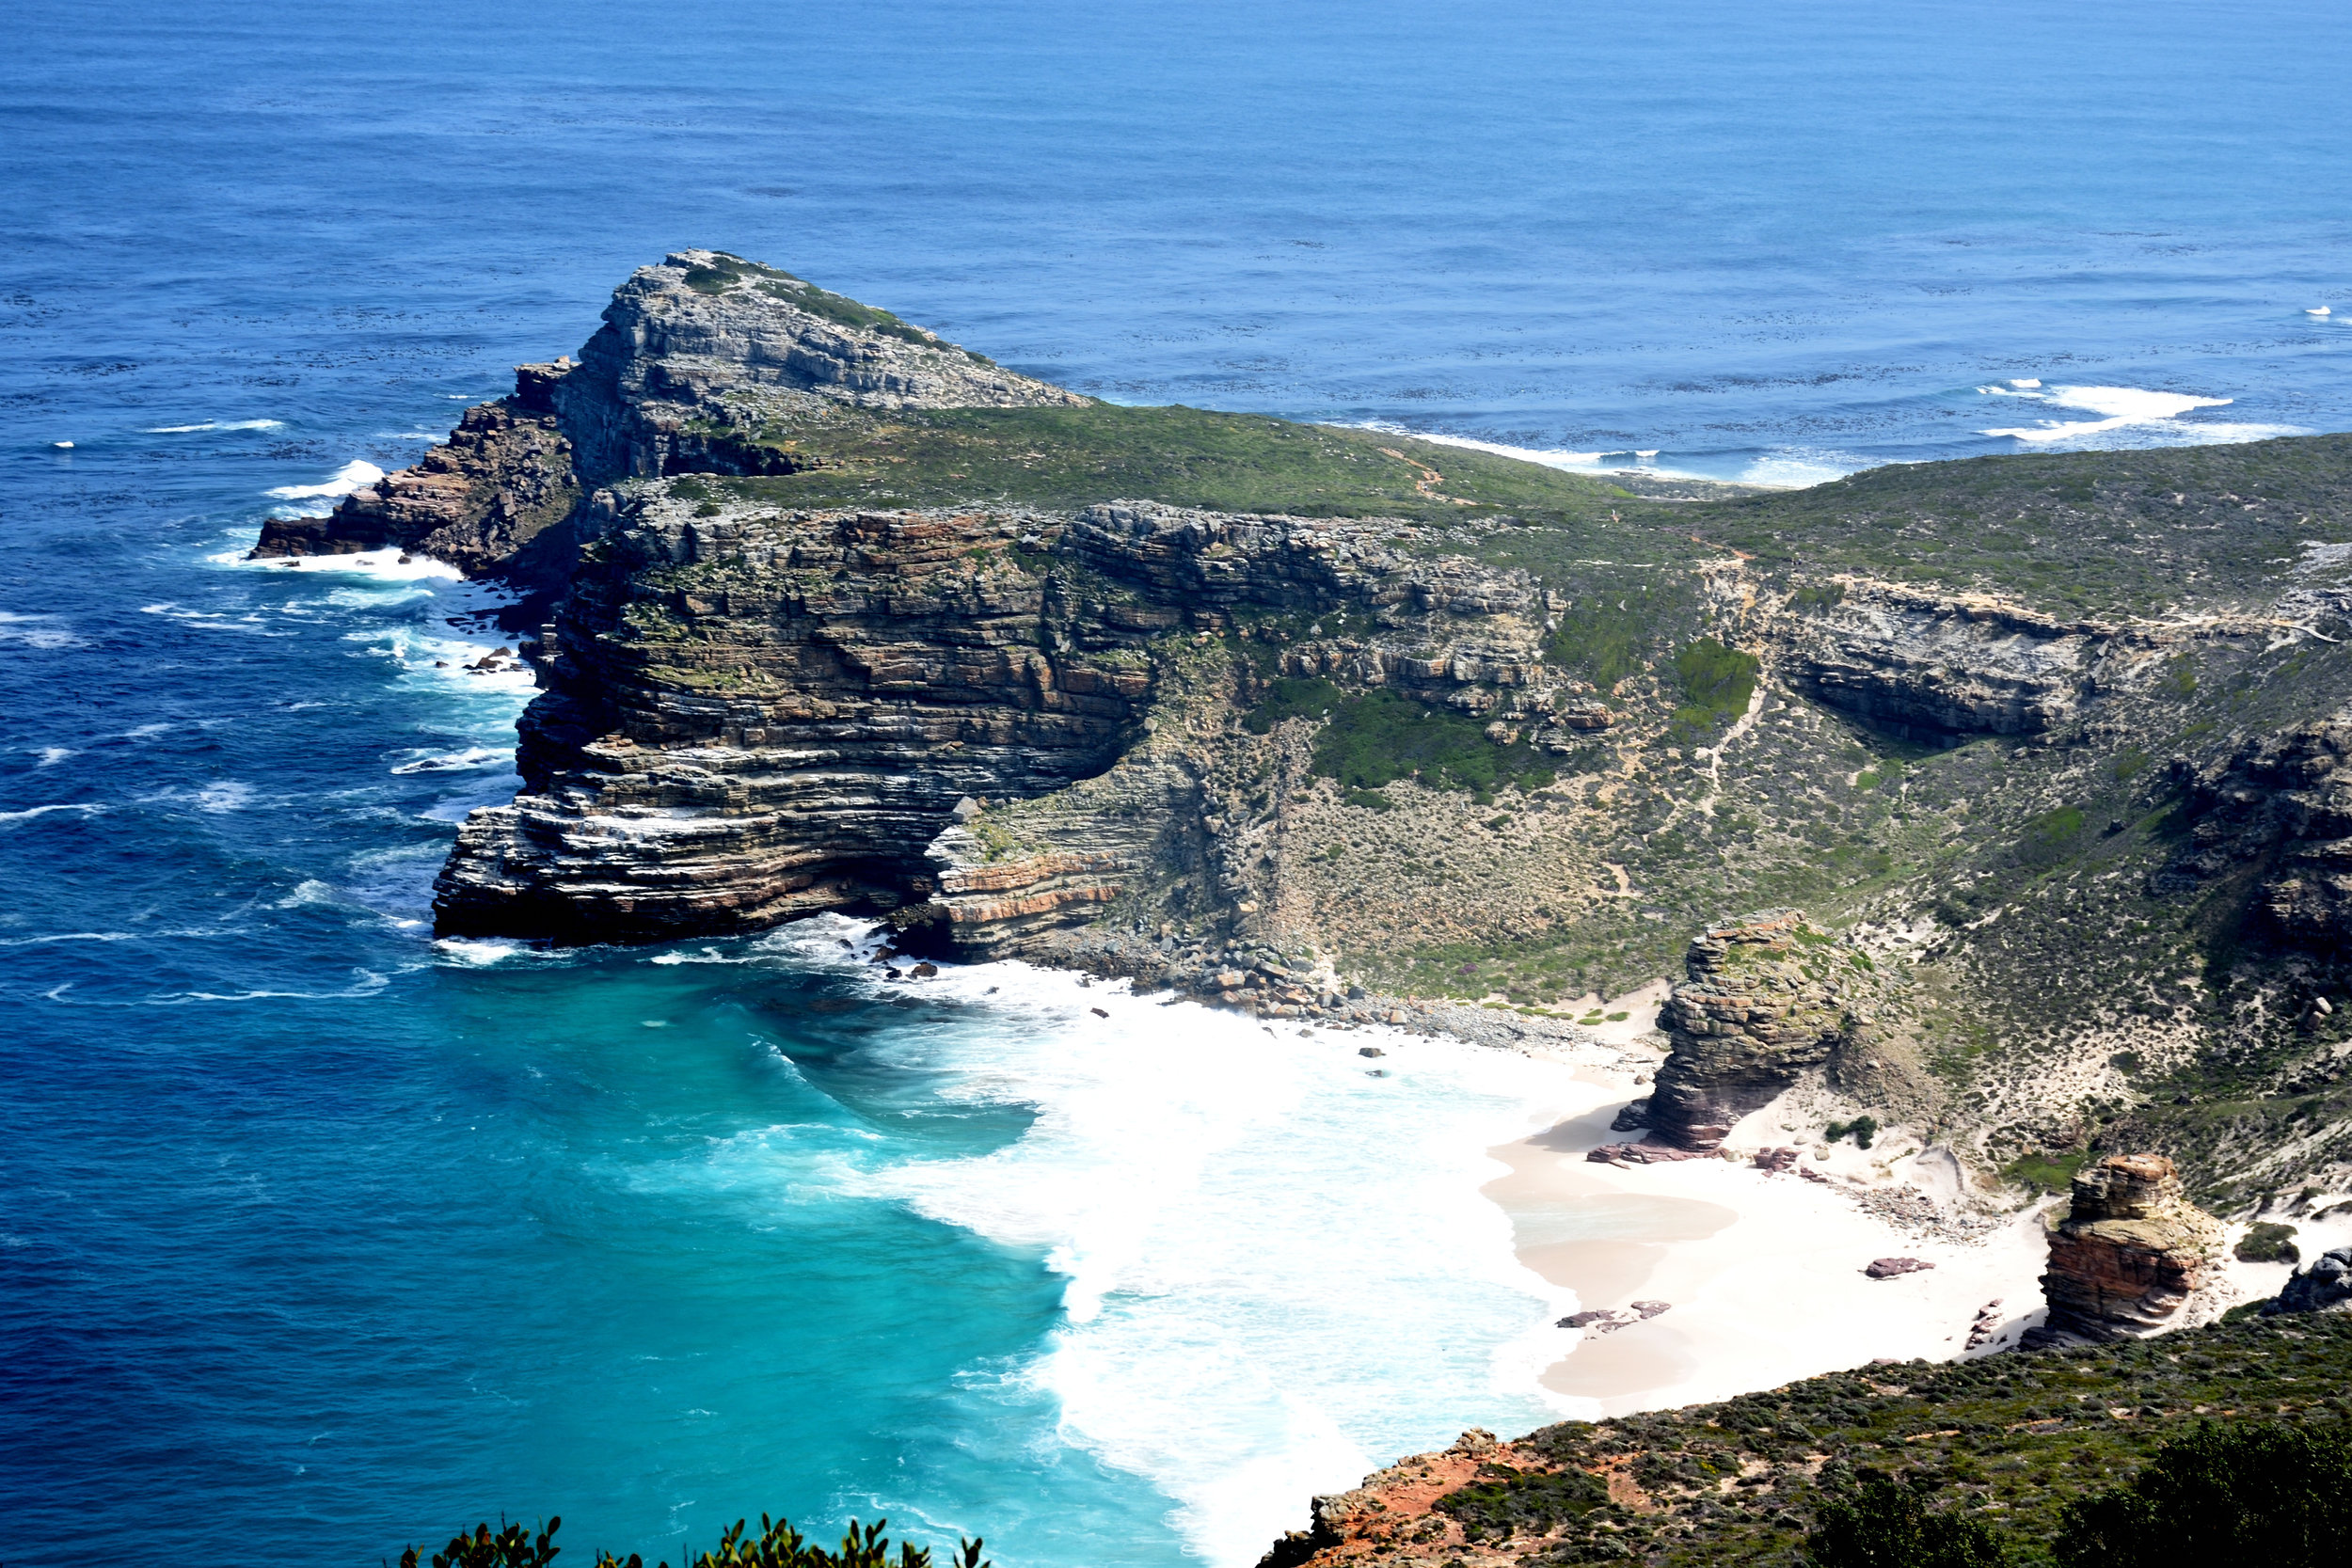 Cape of Good Hope, South Africa, September 2017